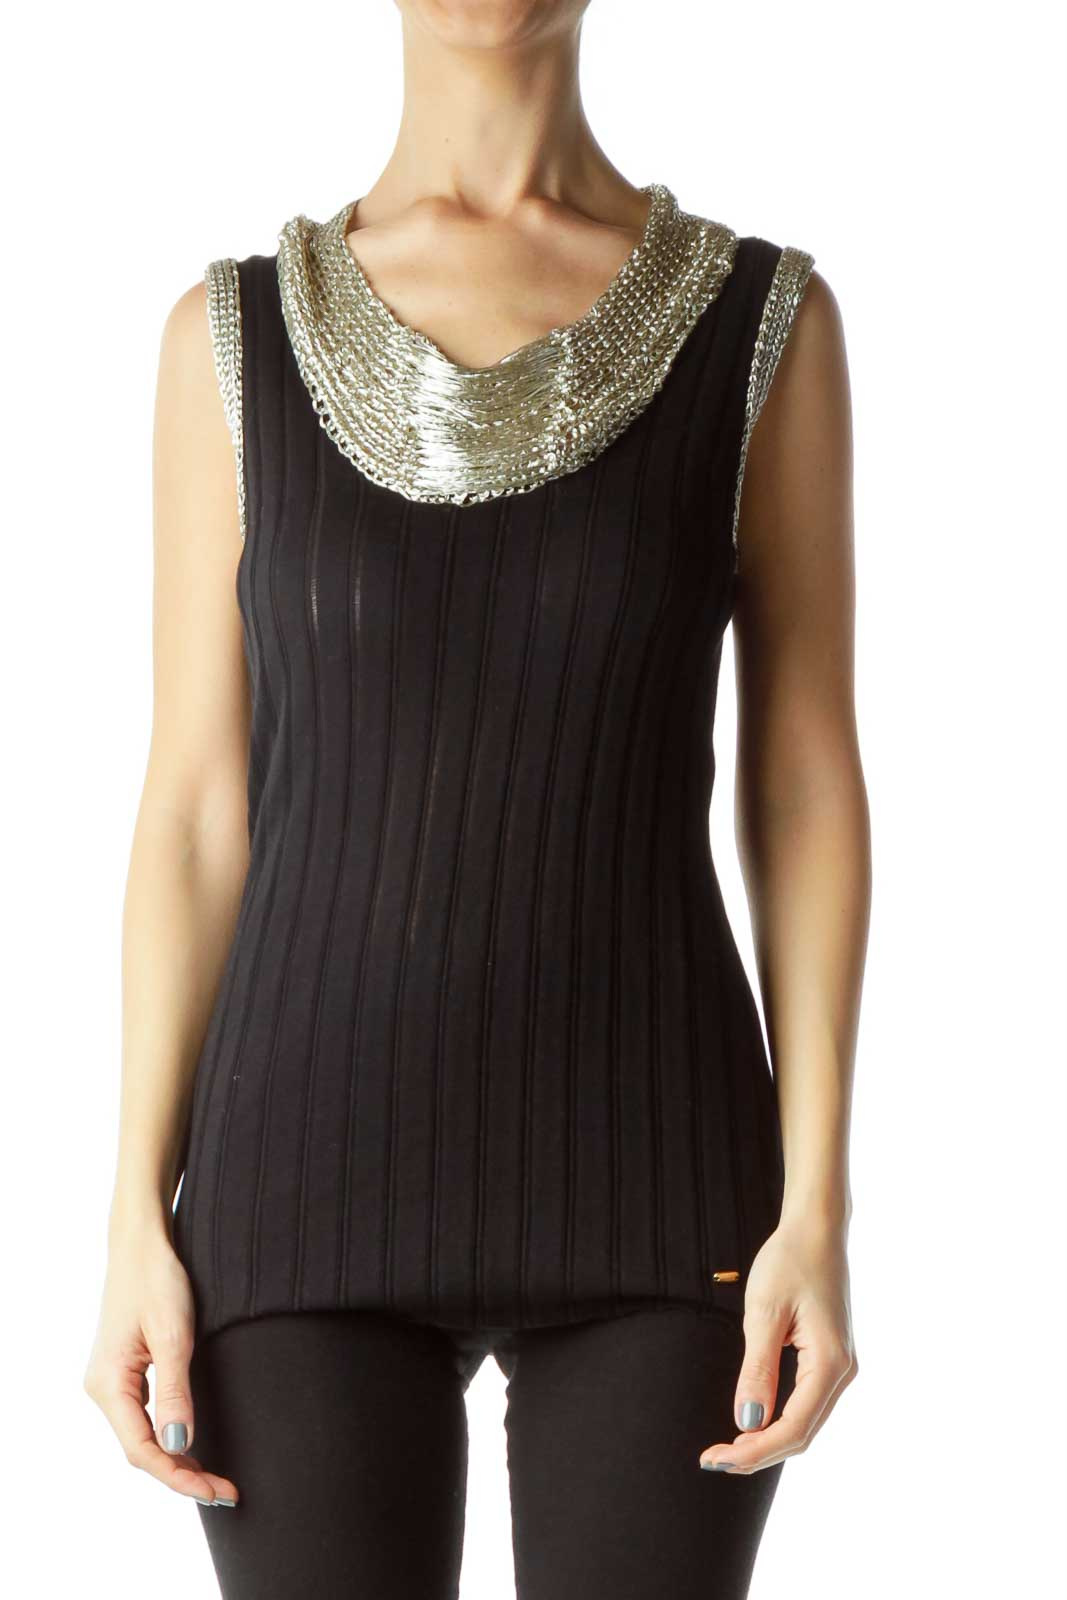 Gold Black Metallic Crocheted Sheer Top